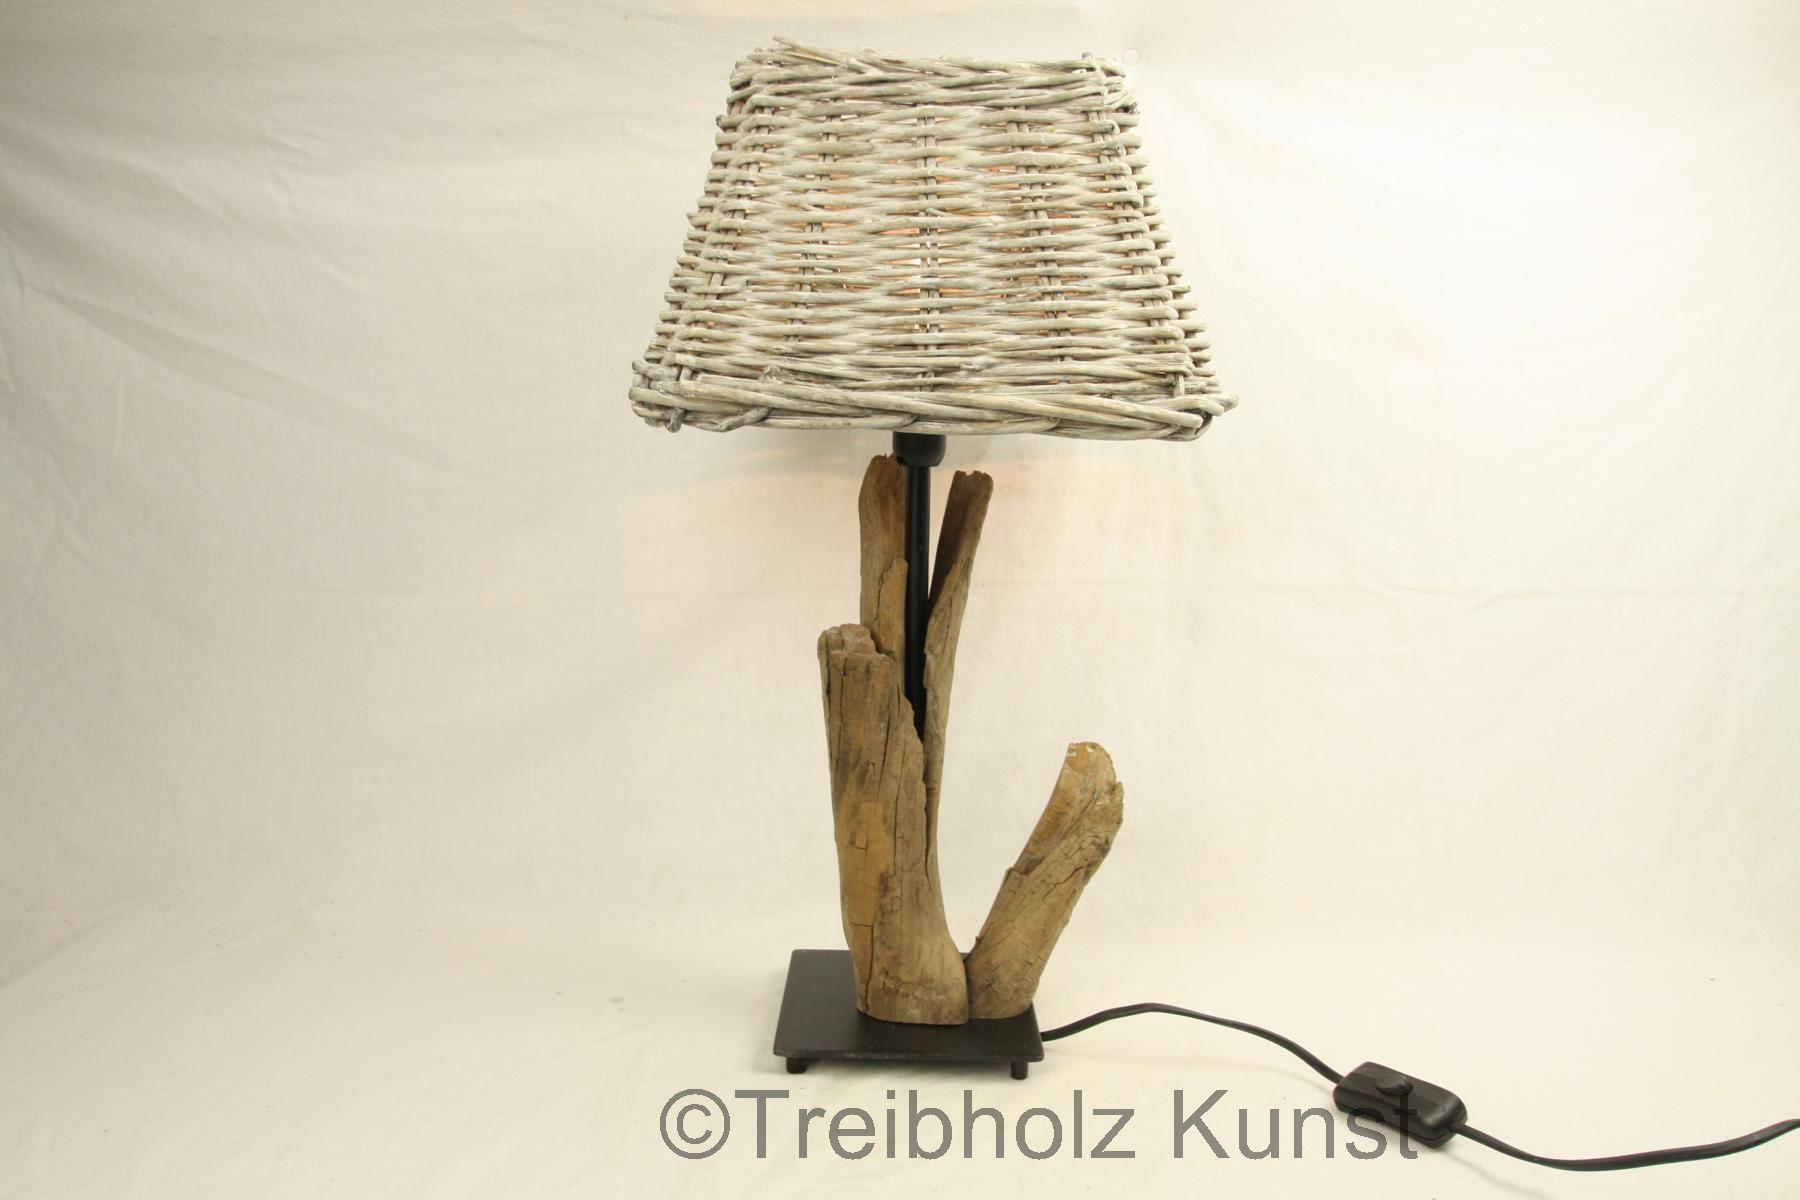 treibholz nachttischlampe. Black Bedroom Furniture Sets. Home Design Ideas